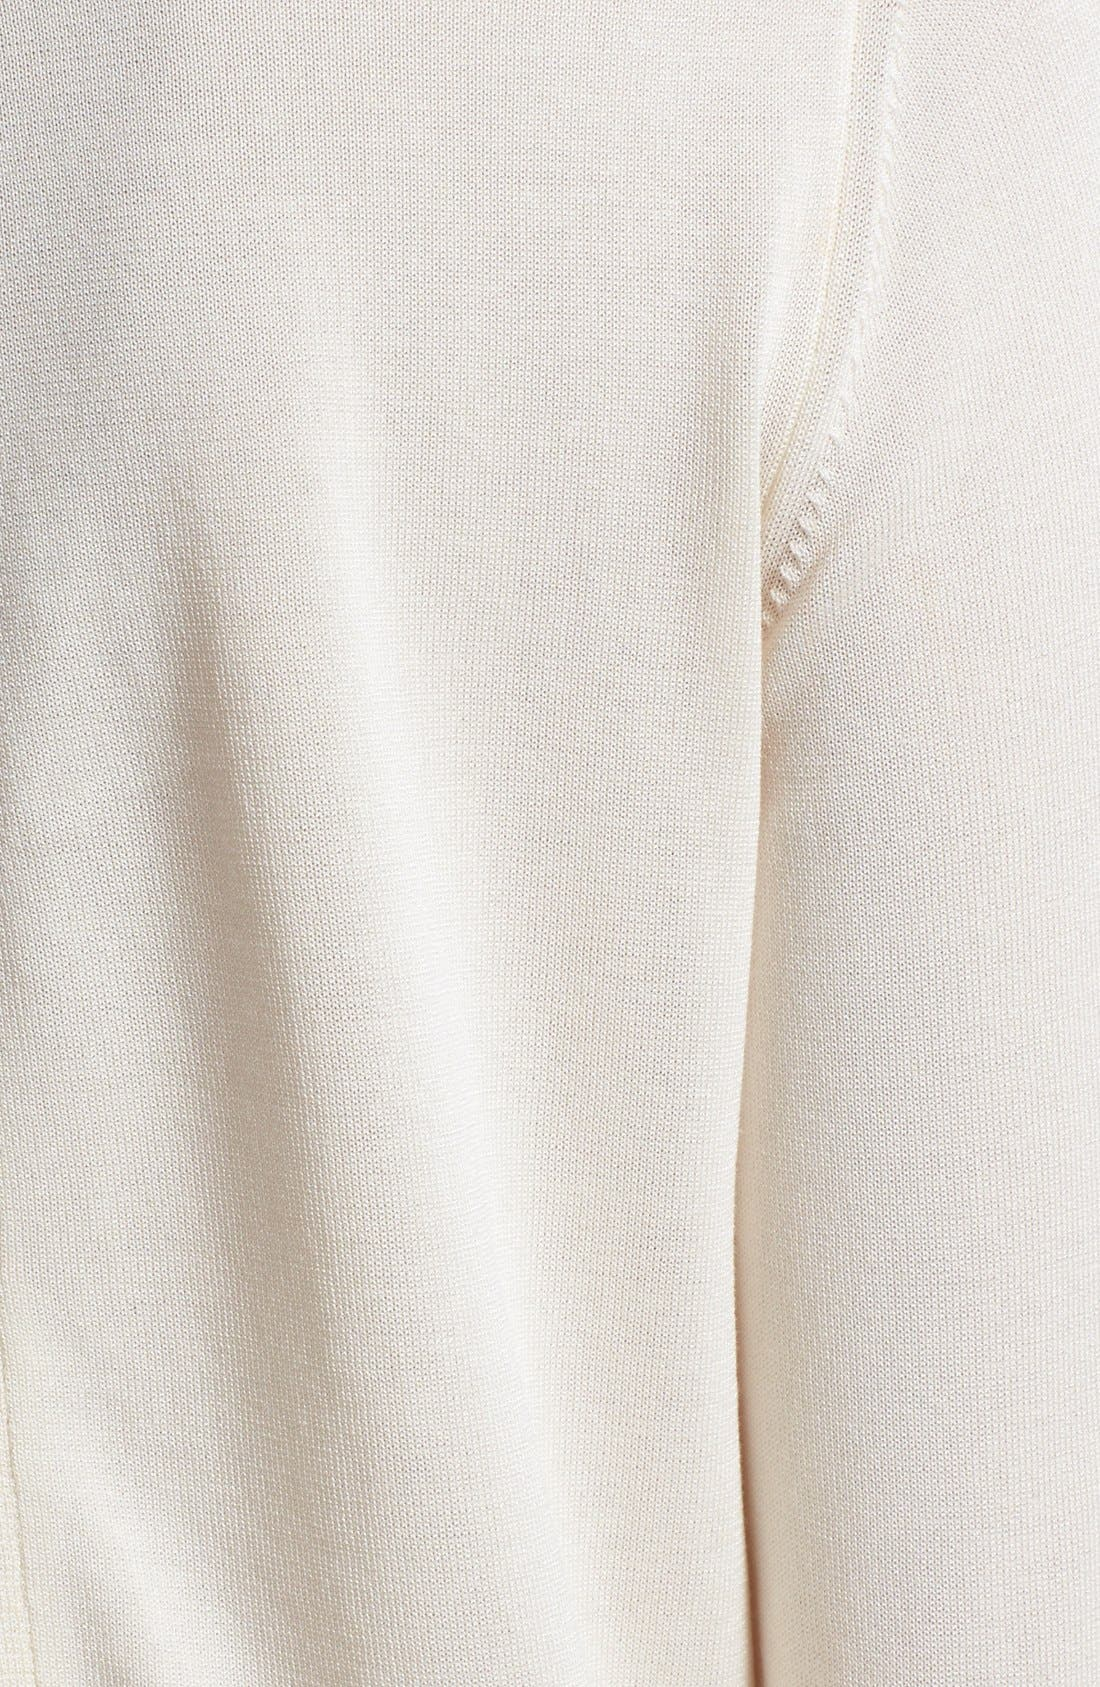 'Maglia' Tricot Button Cardigan,                             Alternate thumbnail 2, color,                             WHITE